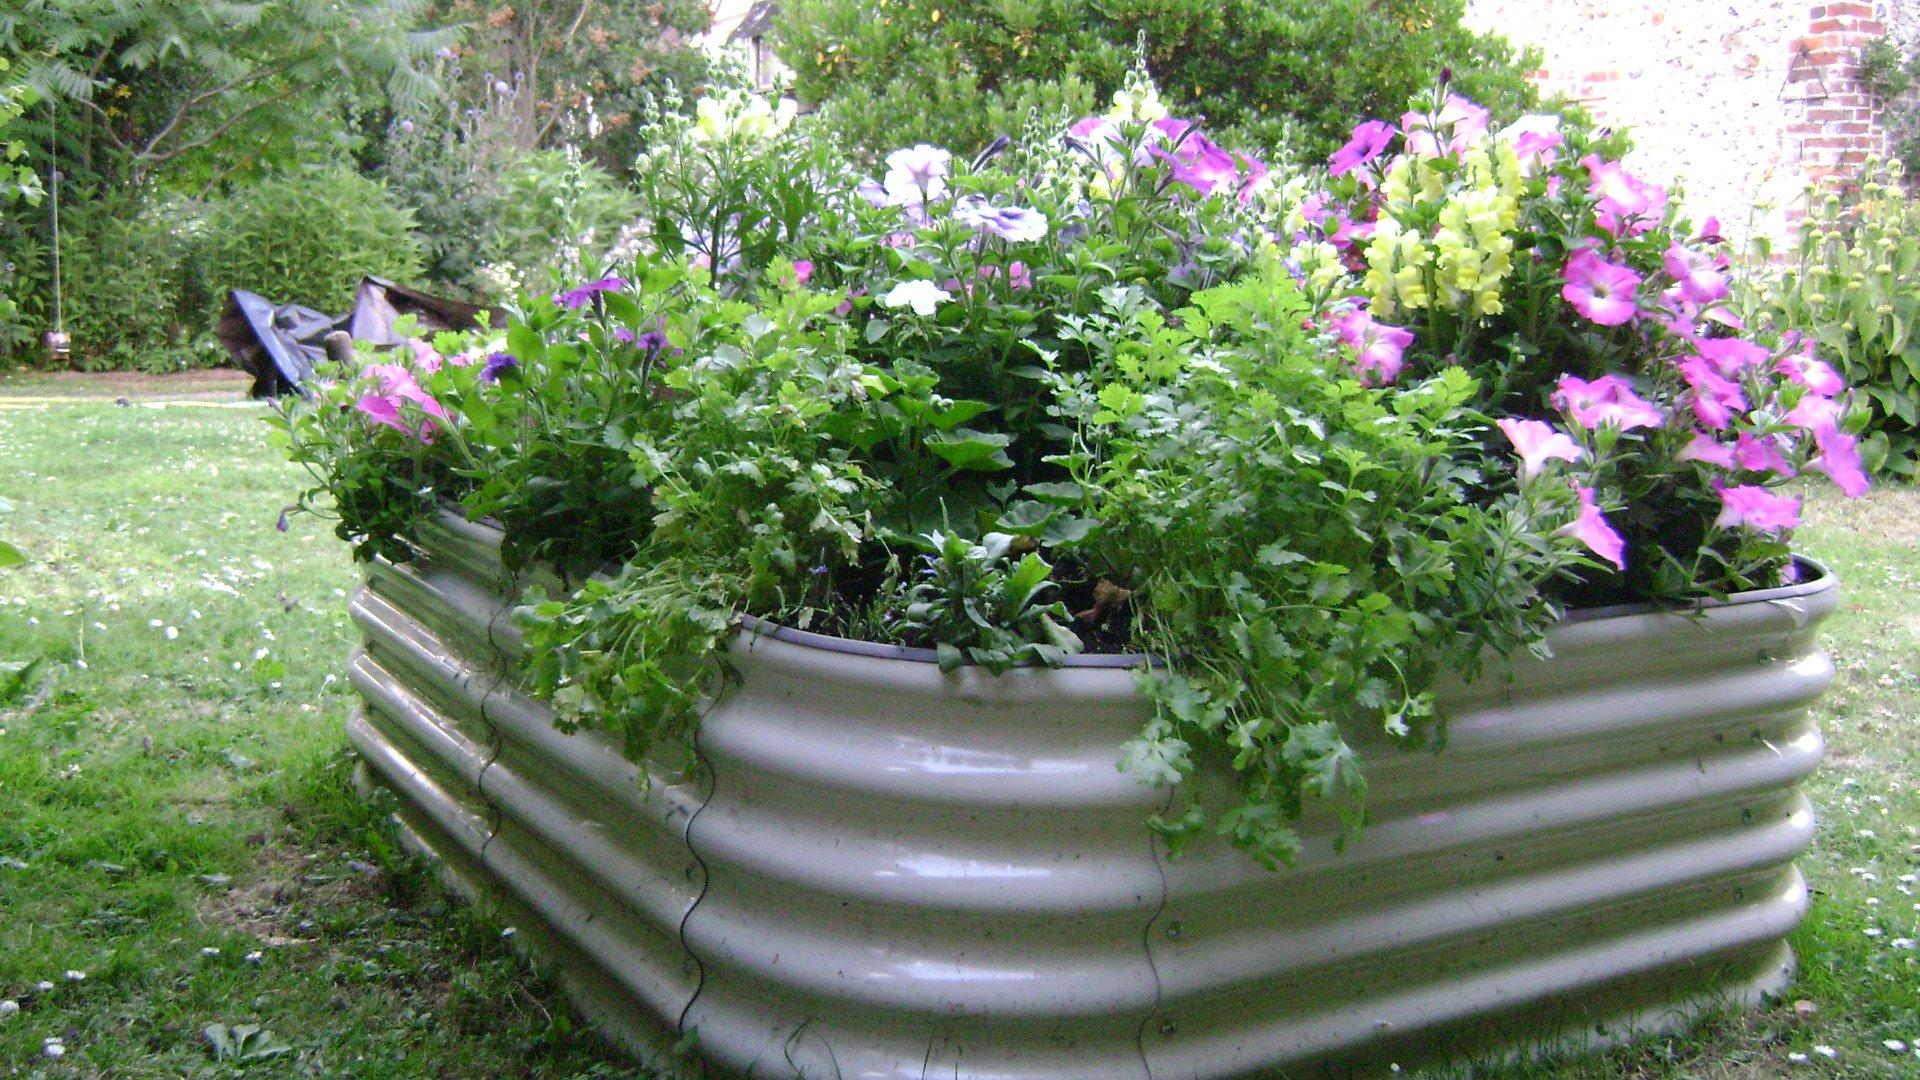 Raised Metal Garden Bed Steel Vegetables Herbs Flowers Allotments 129x129x46 cm